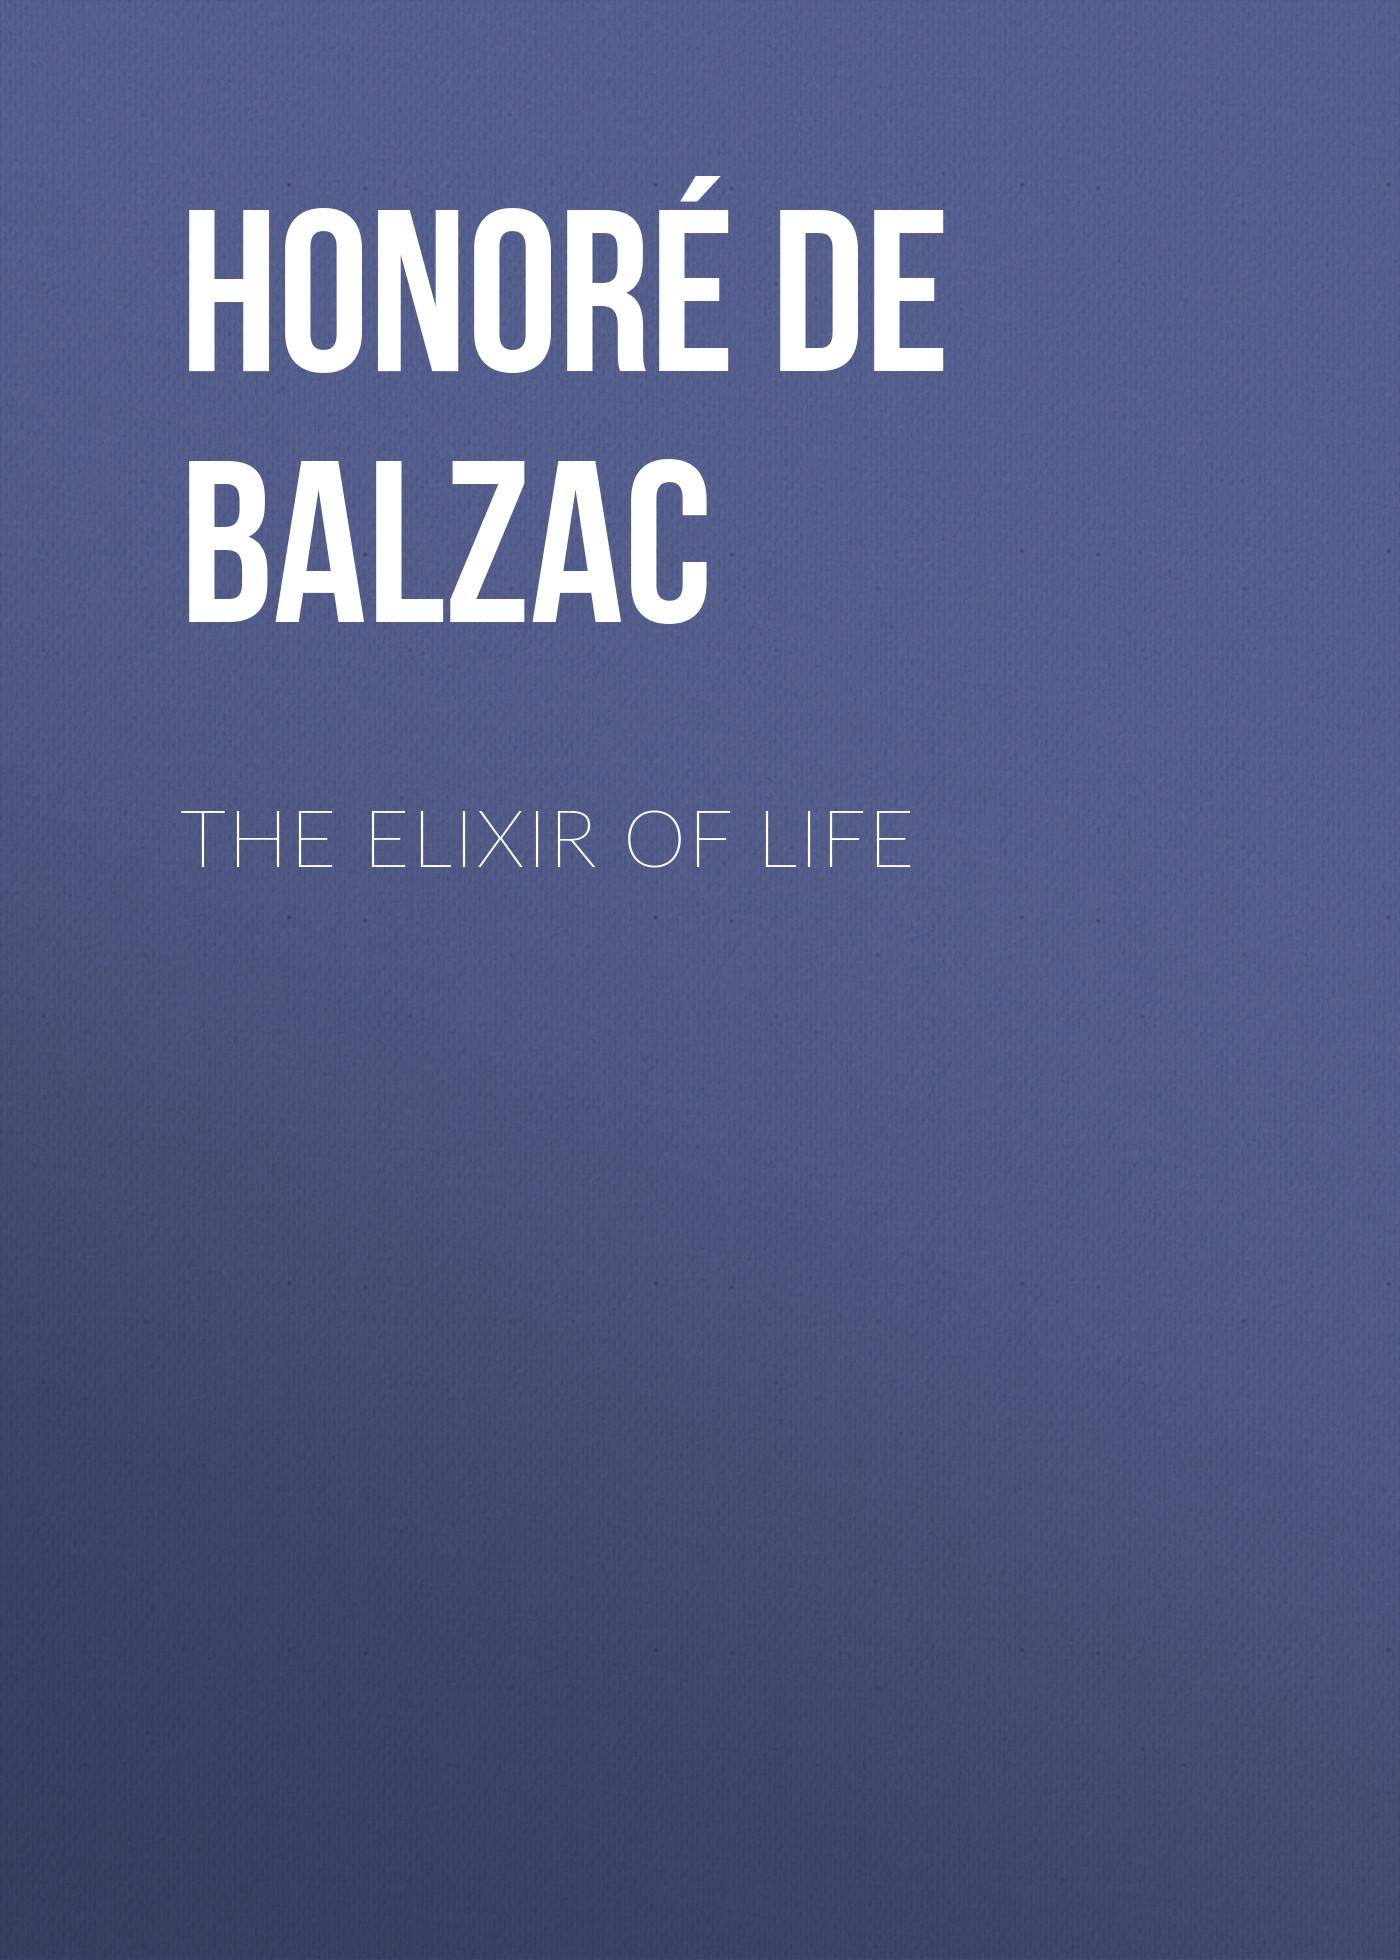 Оноре де Бальзак The Elixir of Life оноре де бальзак the human comedy introductions and appendix